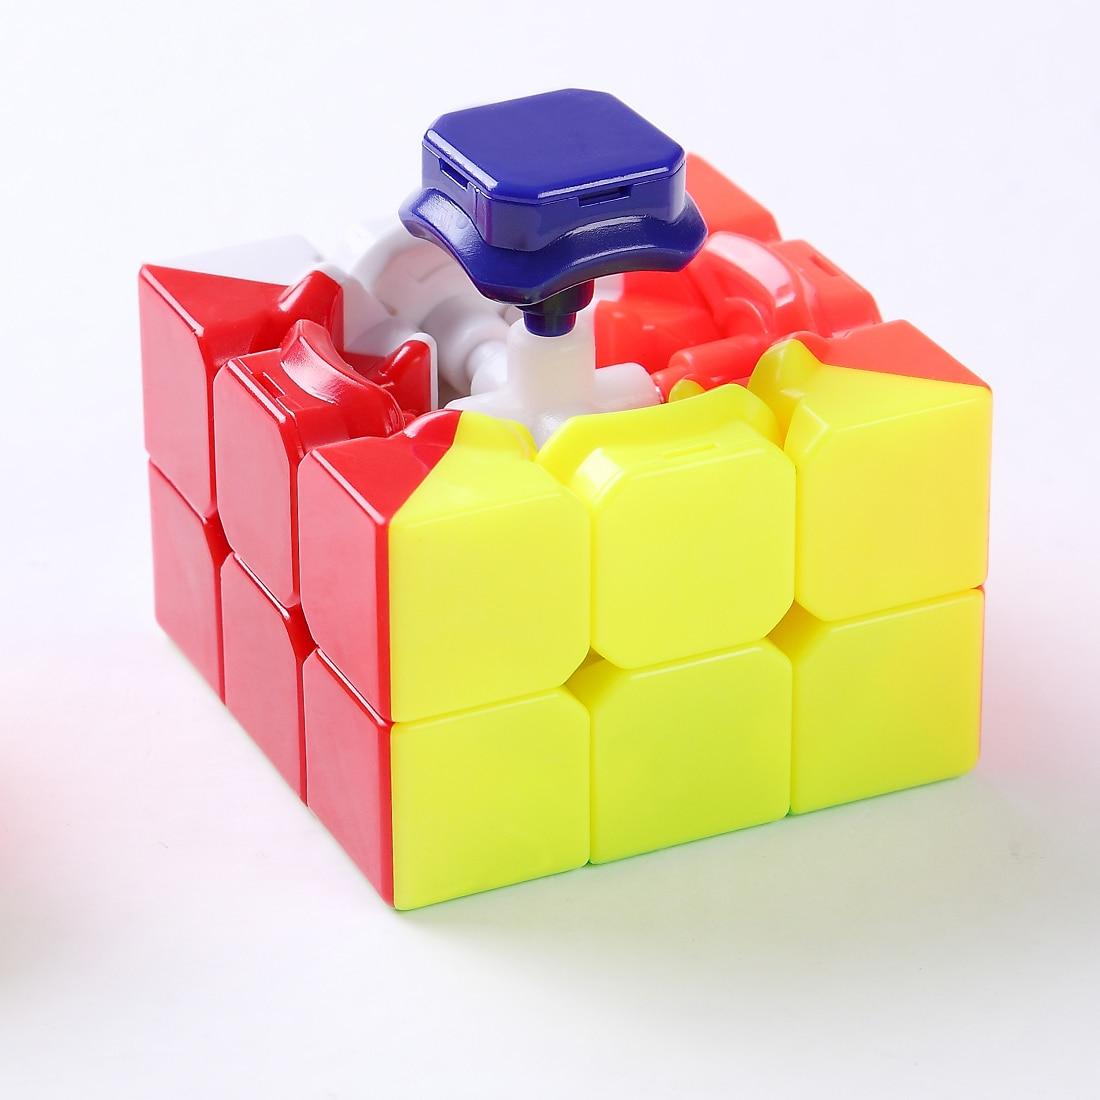 Cube Cyclone Boys FeiWu Mini 3x3x3 Stickerless Speed Cube 40cm or New Qiyi Mofangge Warrior 5.7cm Speed cube